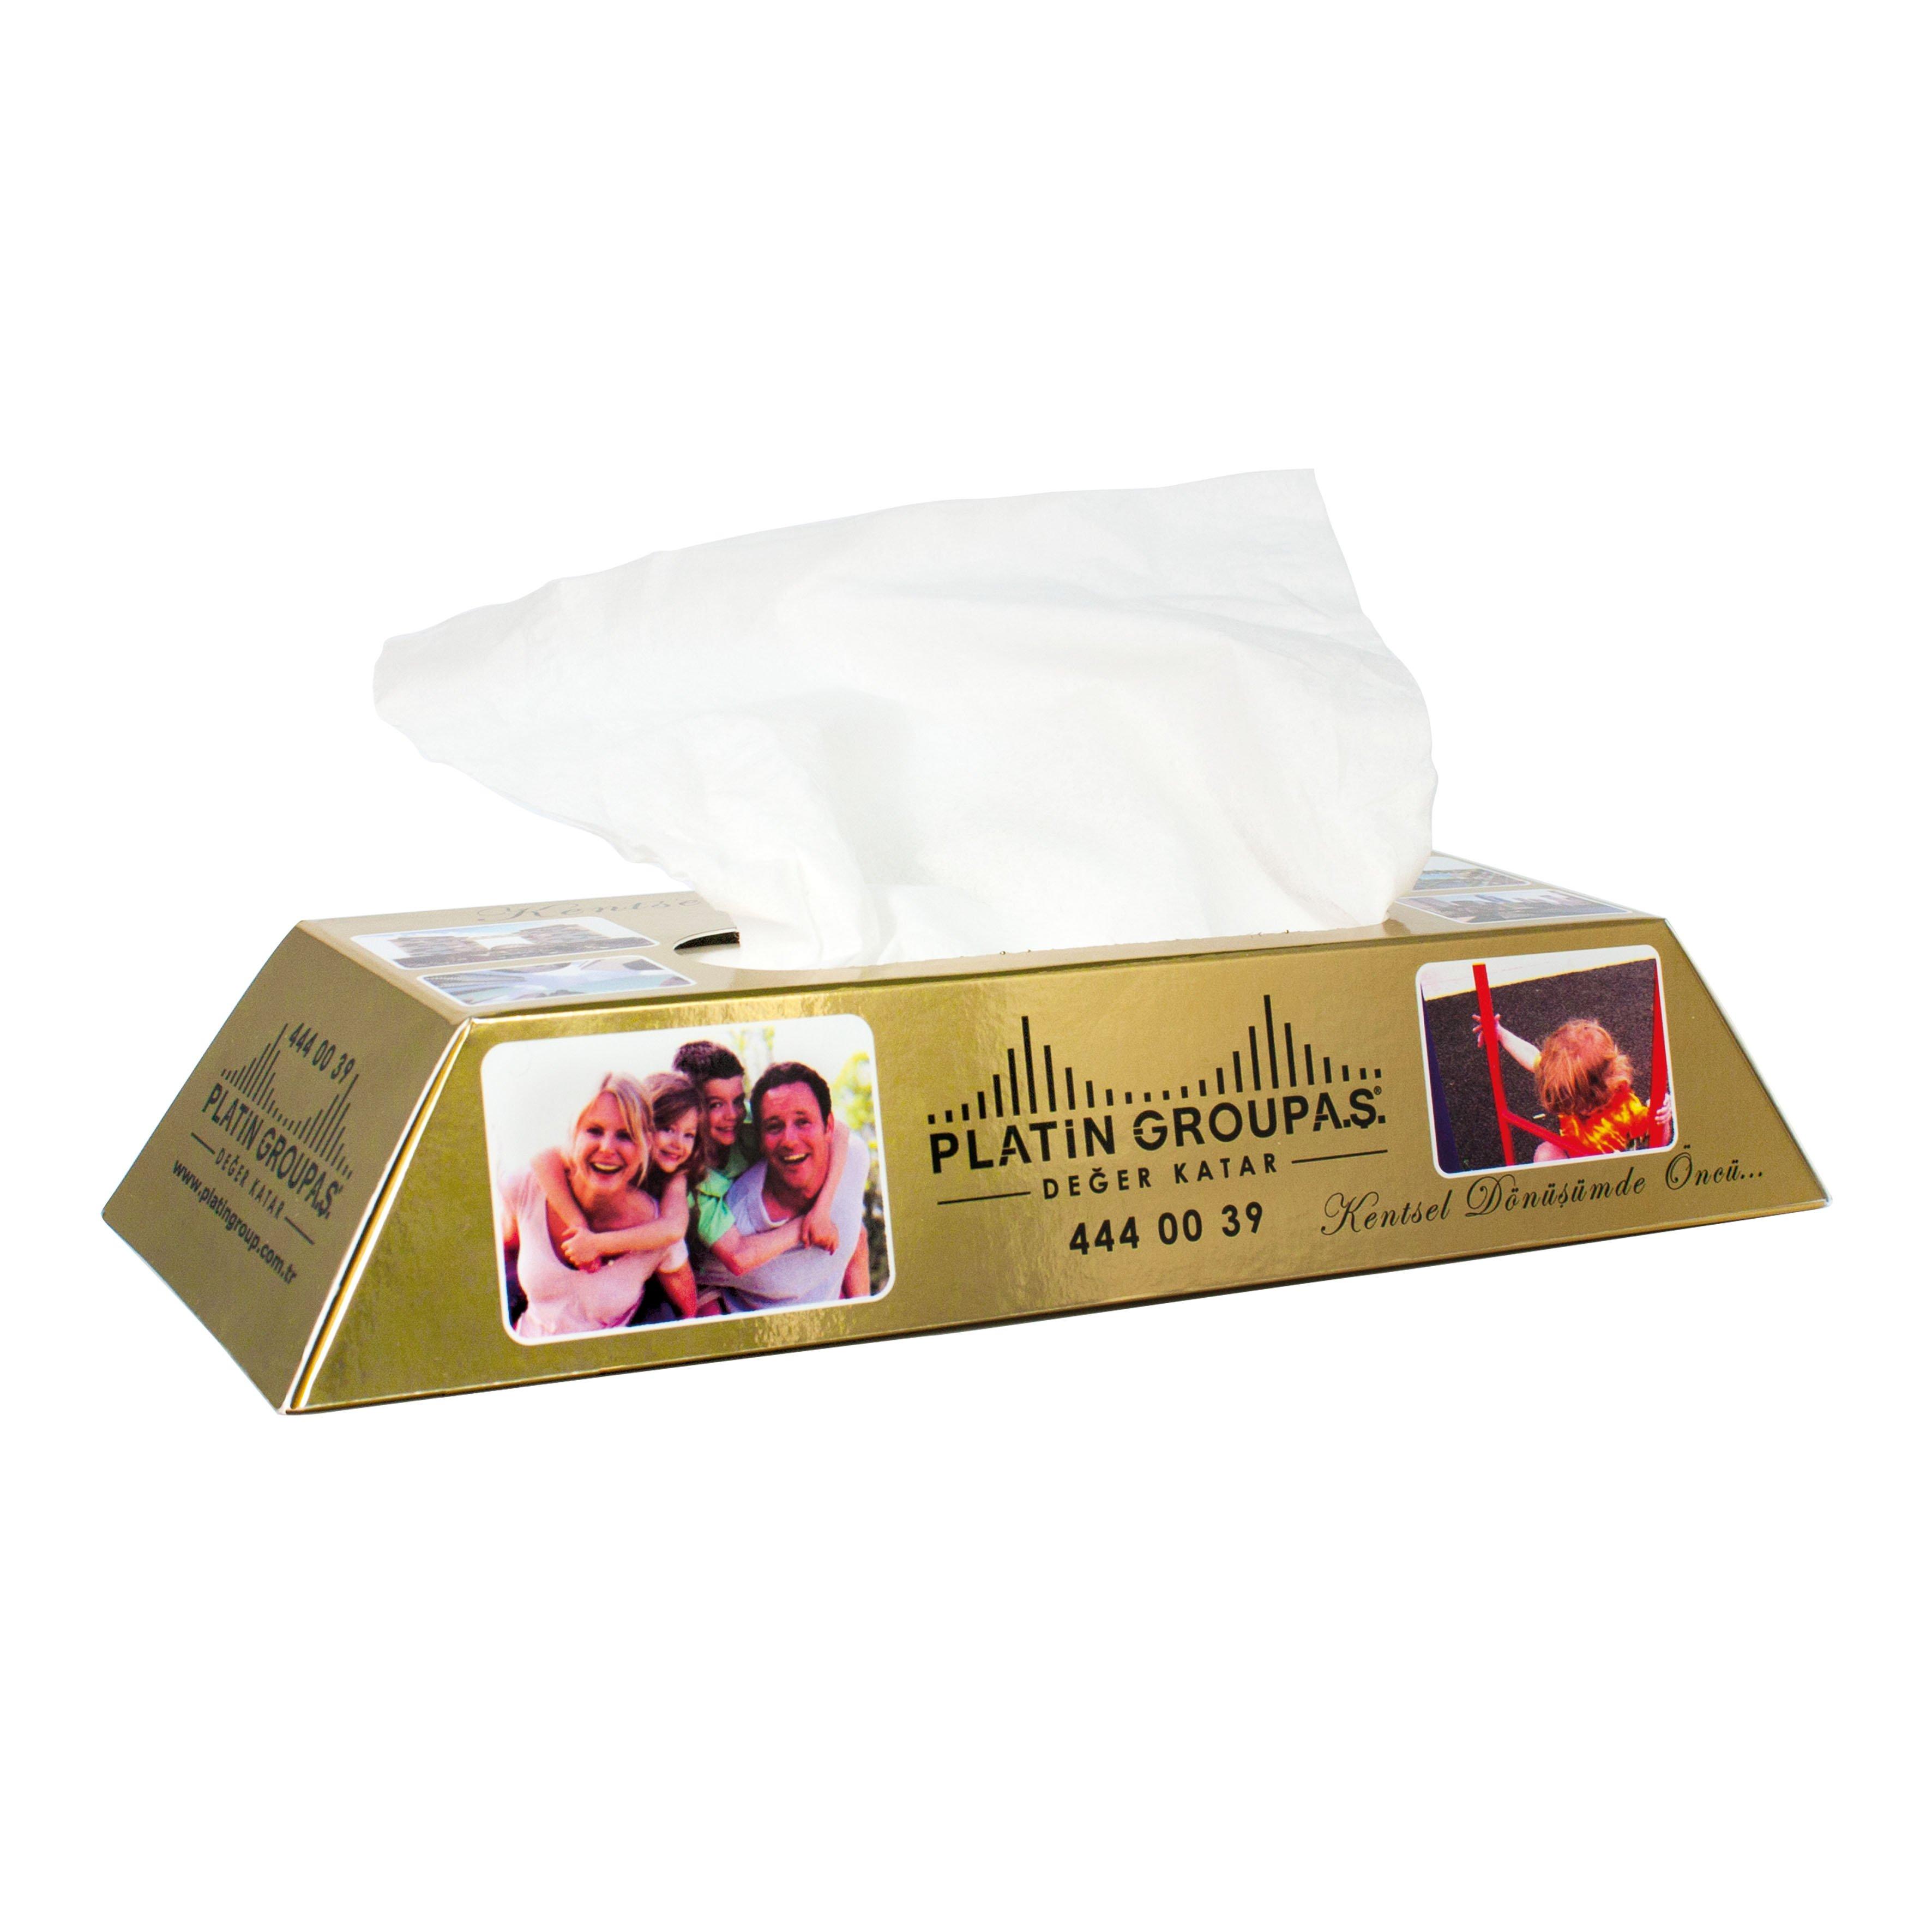 Care & More gold bar tissue box